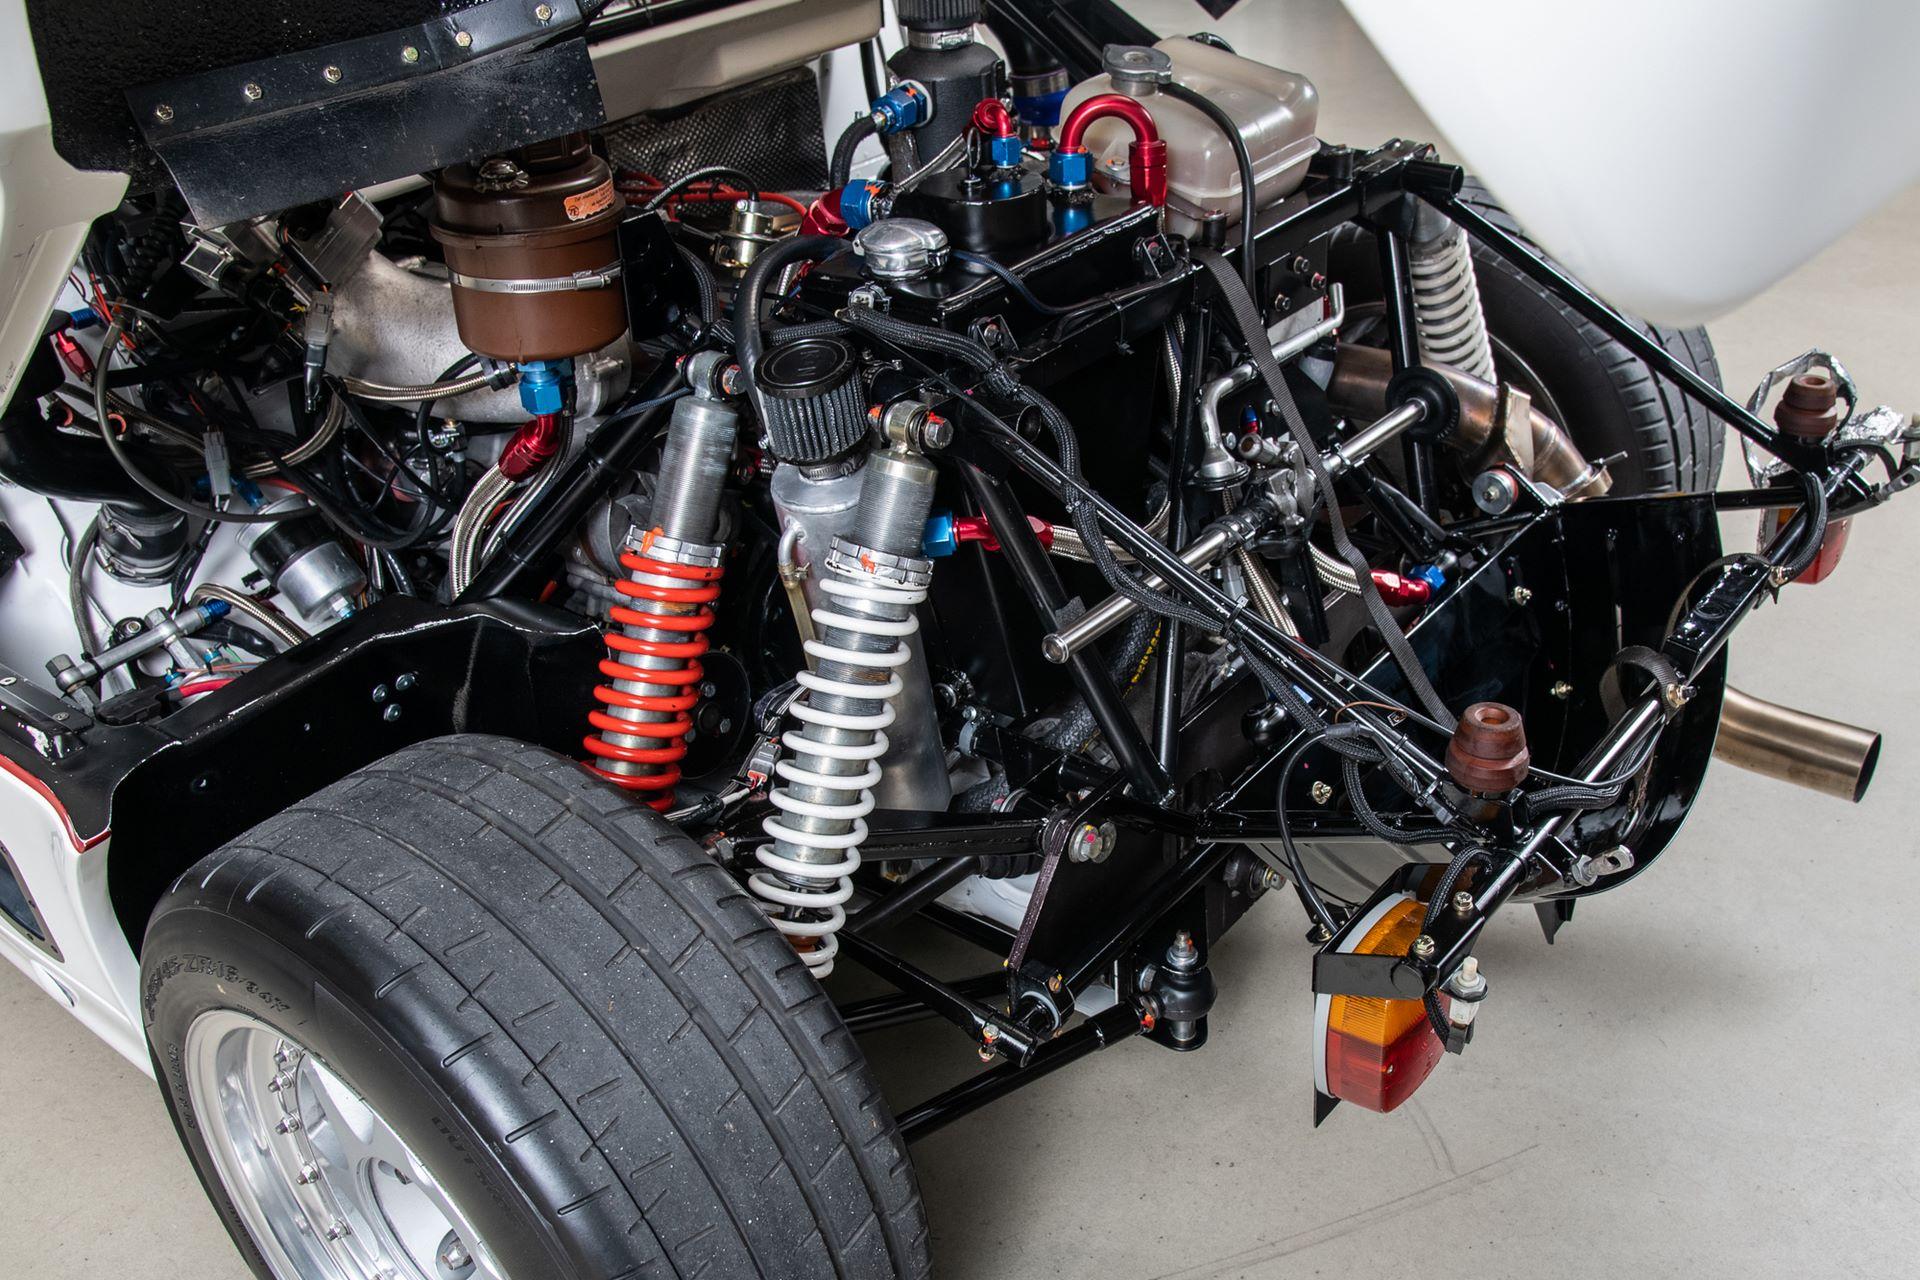 Ford-RS200-Evolution-Evo-for-sale-27